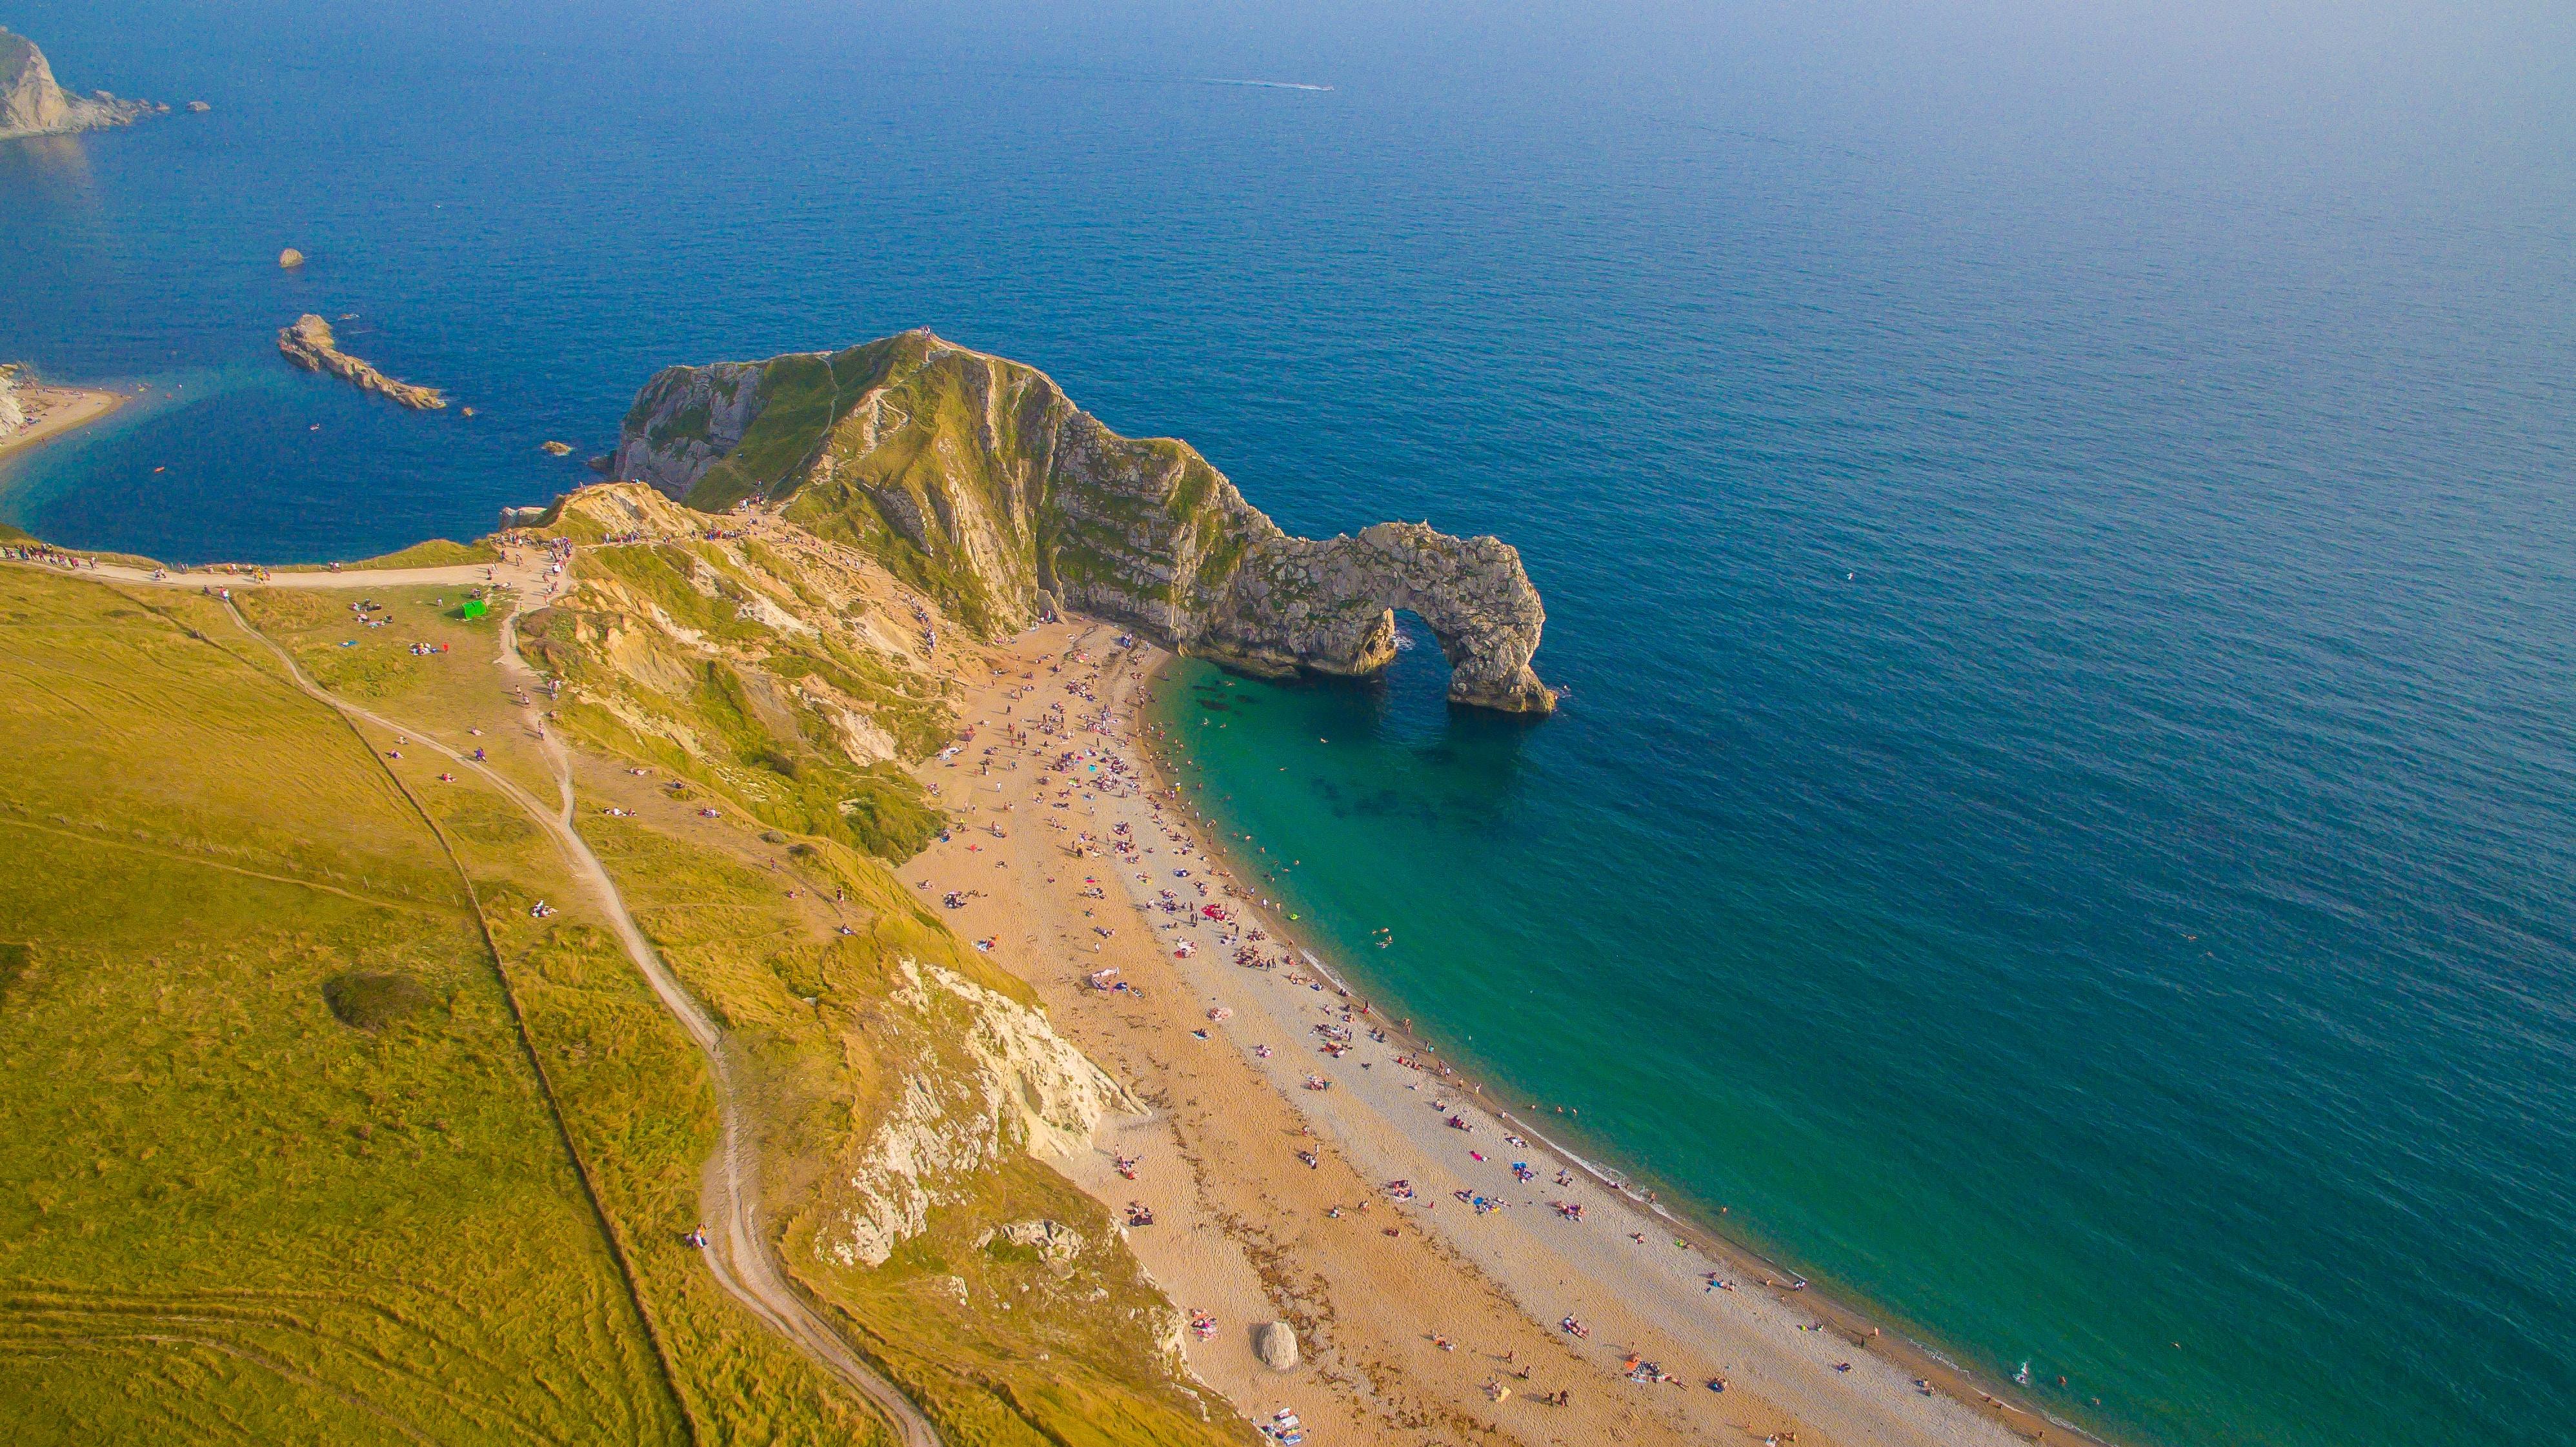 aerial photography of mountain near shore